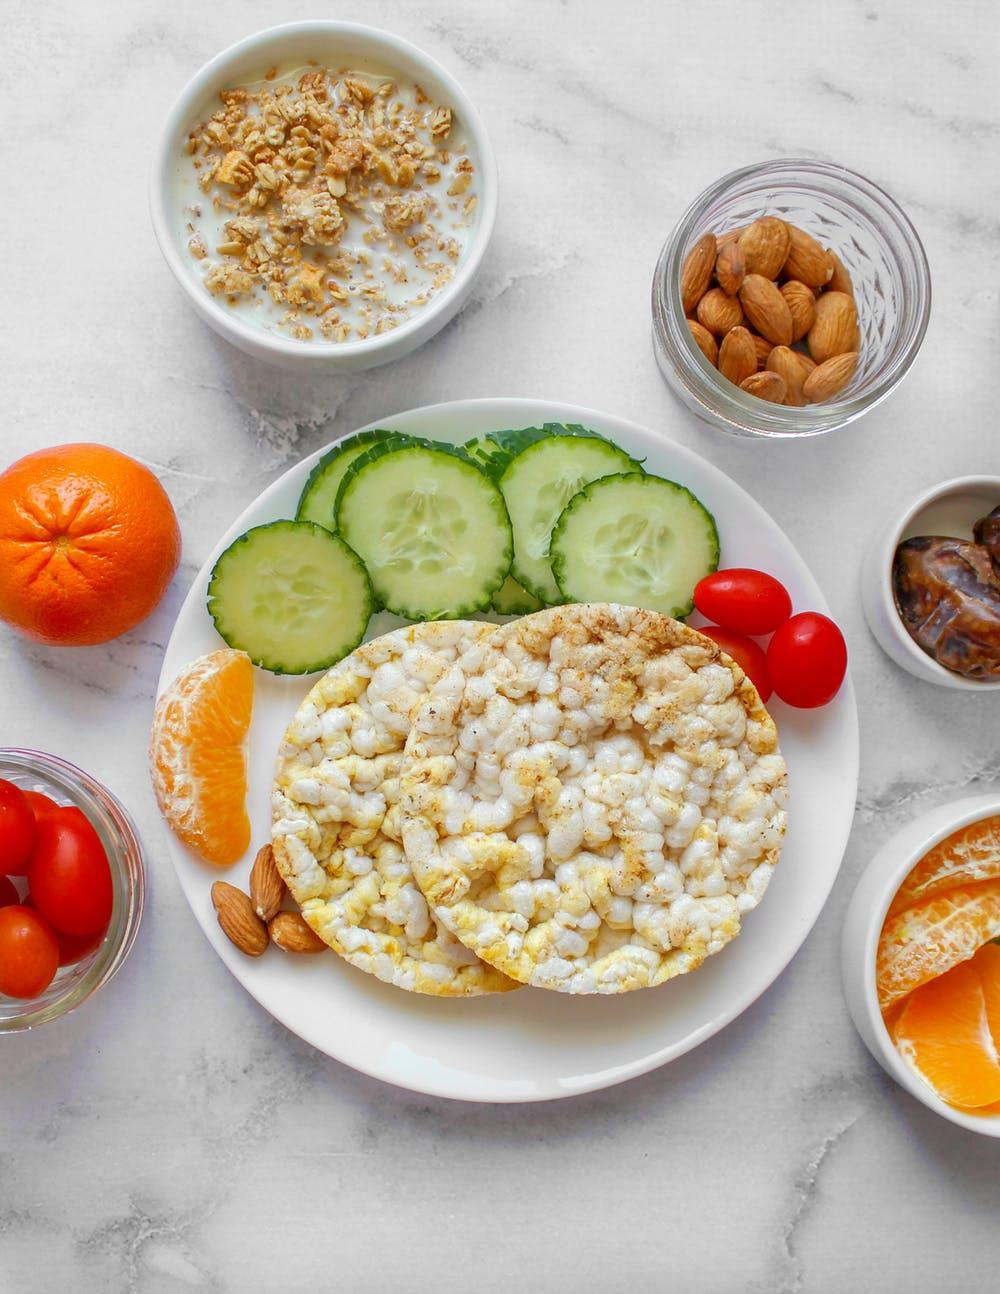 vegan-breakfast-ideas1.jpg